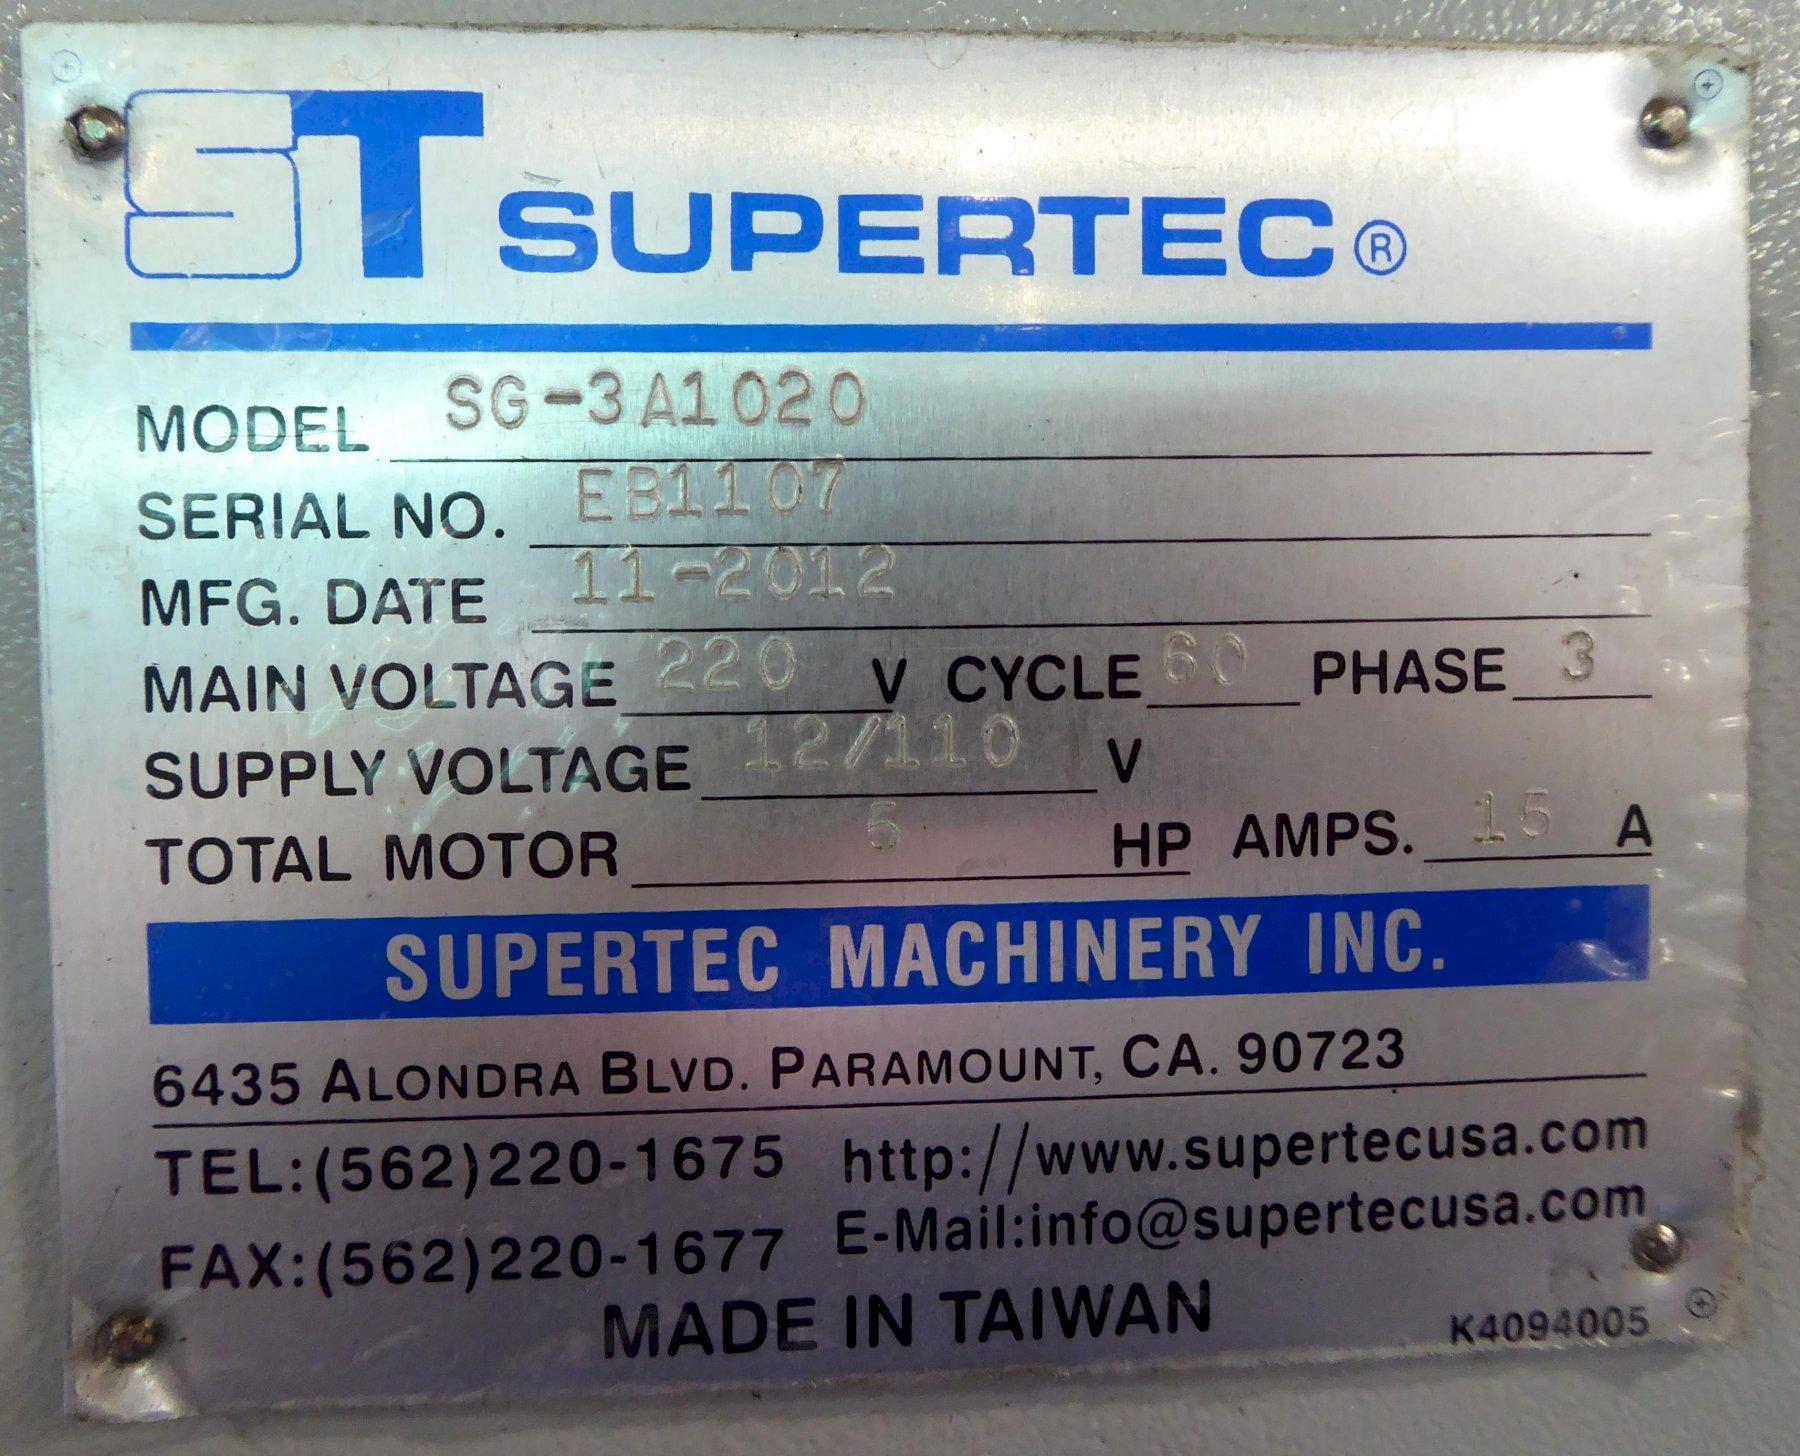 "10"" x 20"" Supertec Surface Grinder No. SG-3A1020, 3-Axis, Mitsubishi PLC, 2012, Excellent"